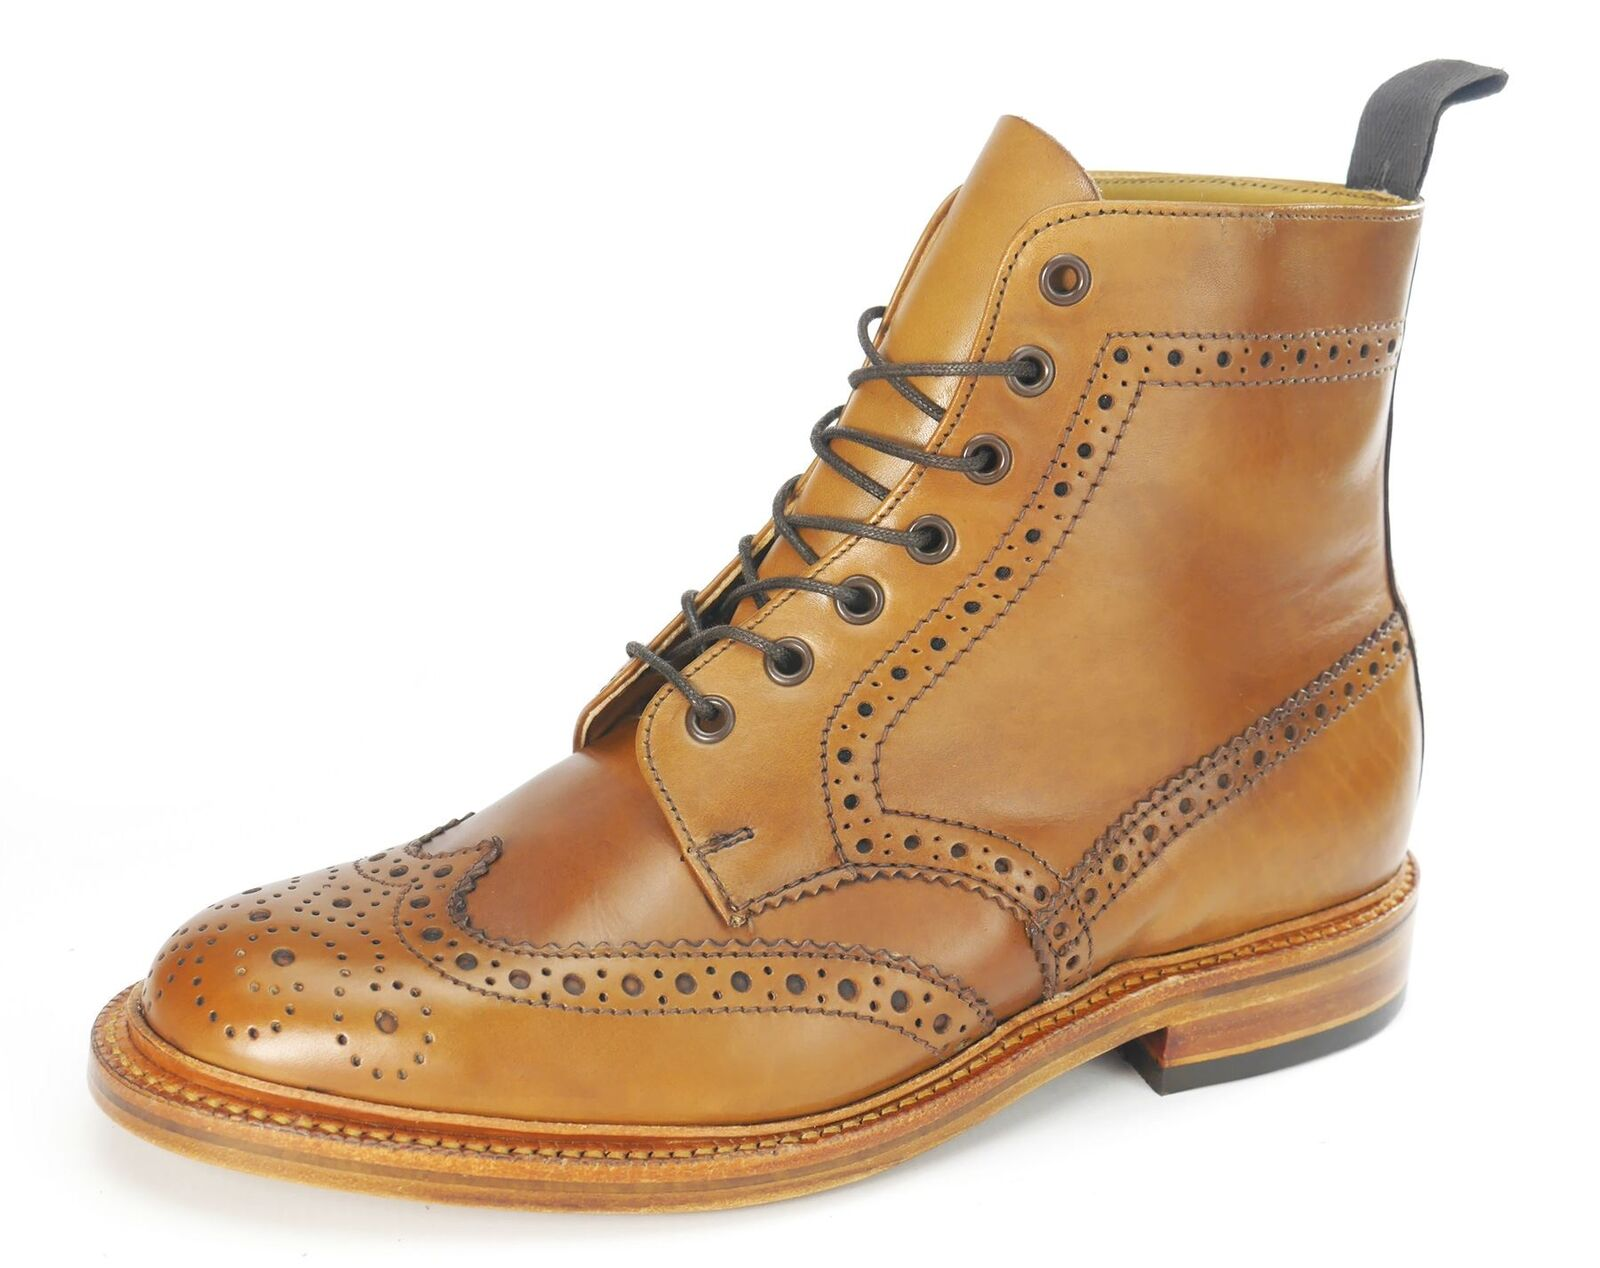 Charles Horrel Newmarket Britsh Welted   Herren Brogue Ankle Stiefel Tan Braun